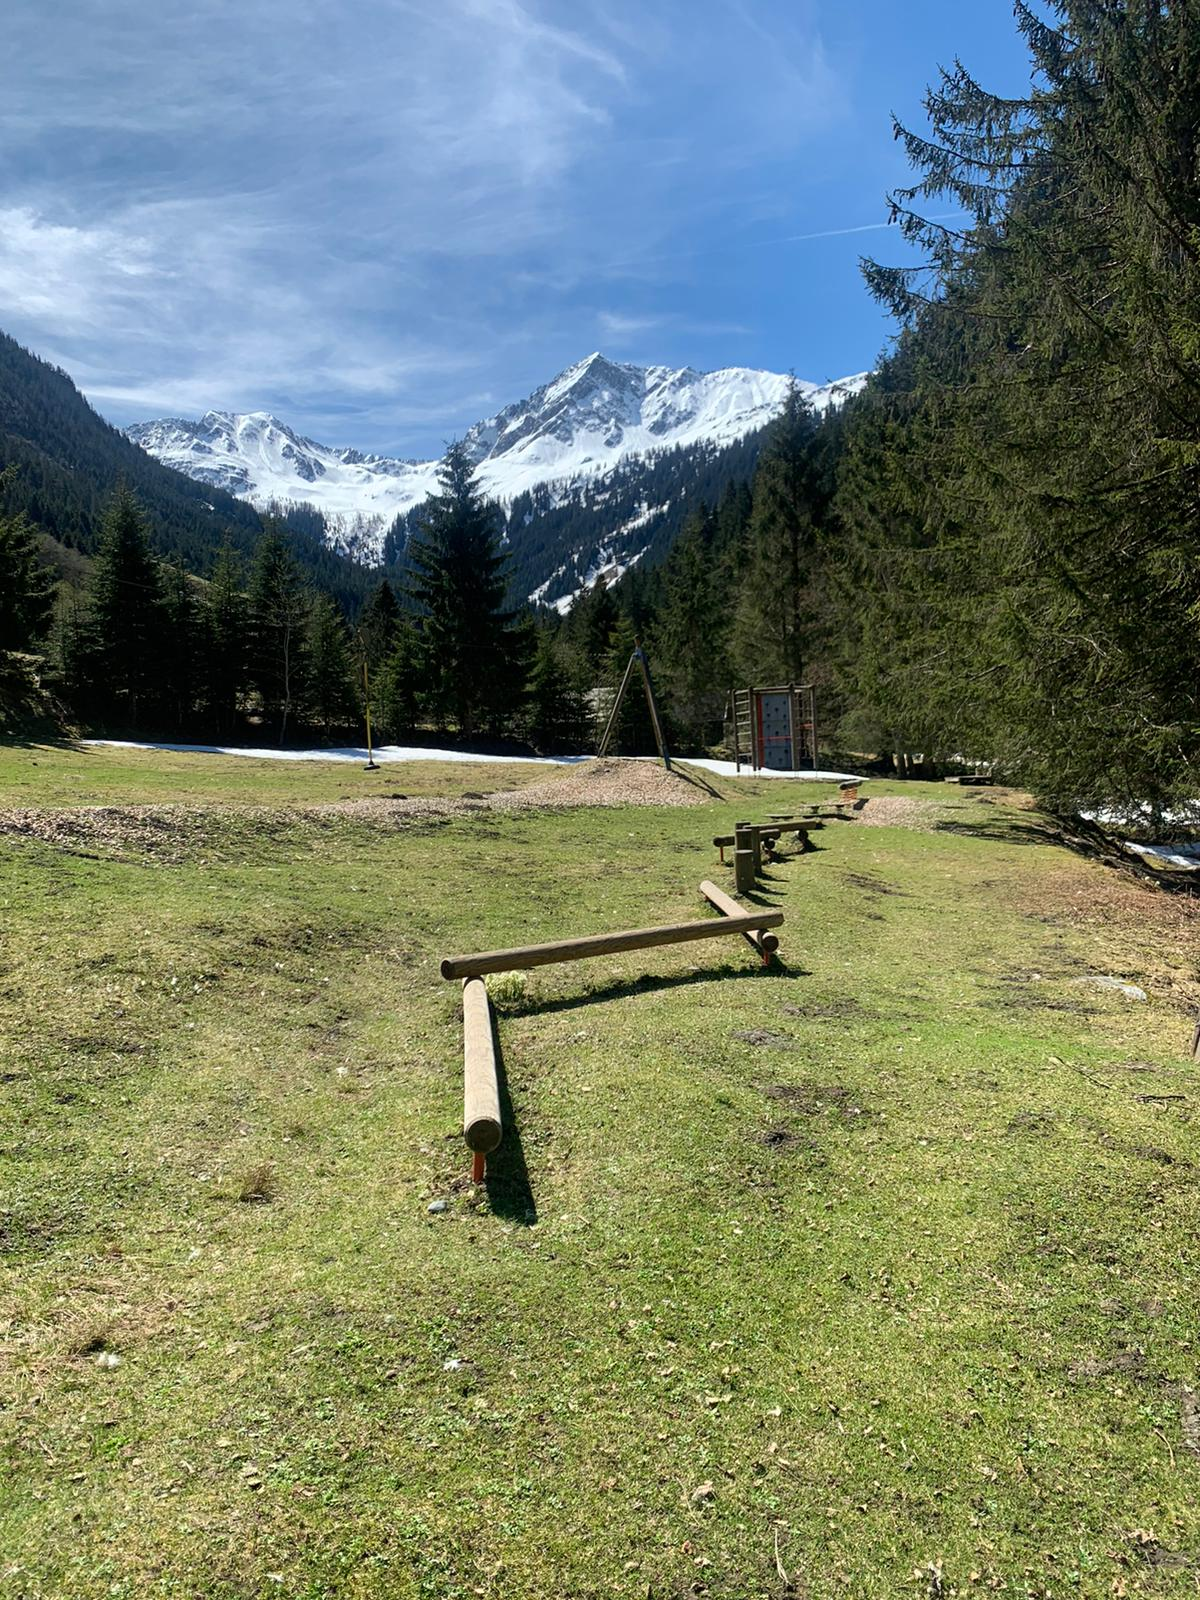 Spielplatz Fellimännle, Erlebnisweg litzbach, erlebnisweg fellimännle